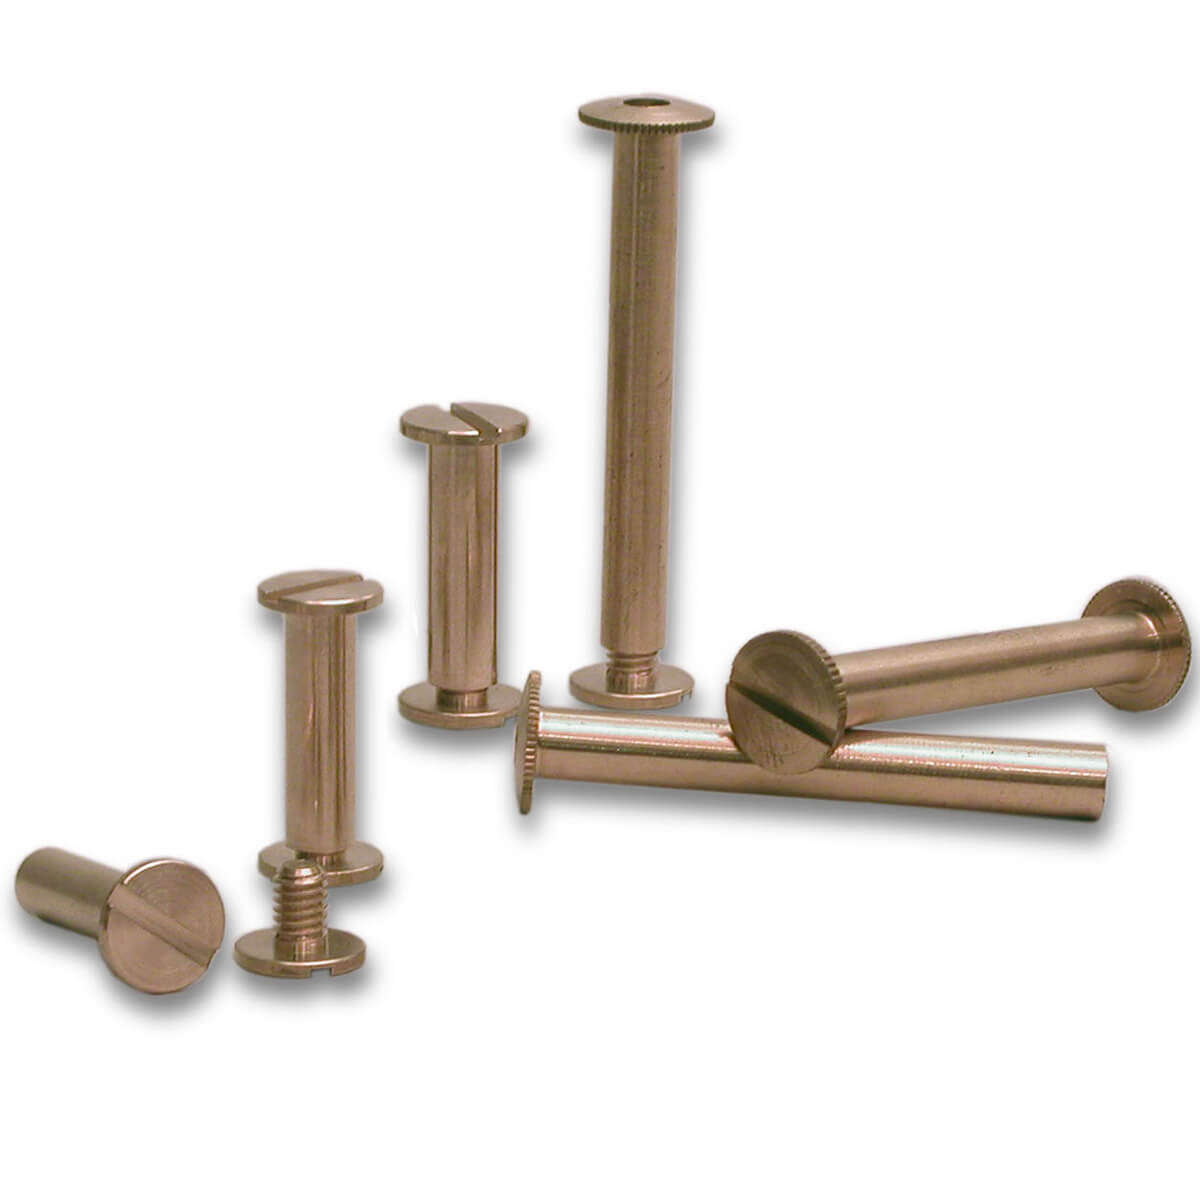 Brass Binder And Screw Post, Chicago Screws